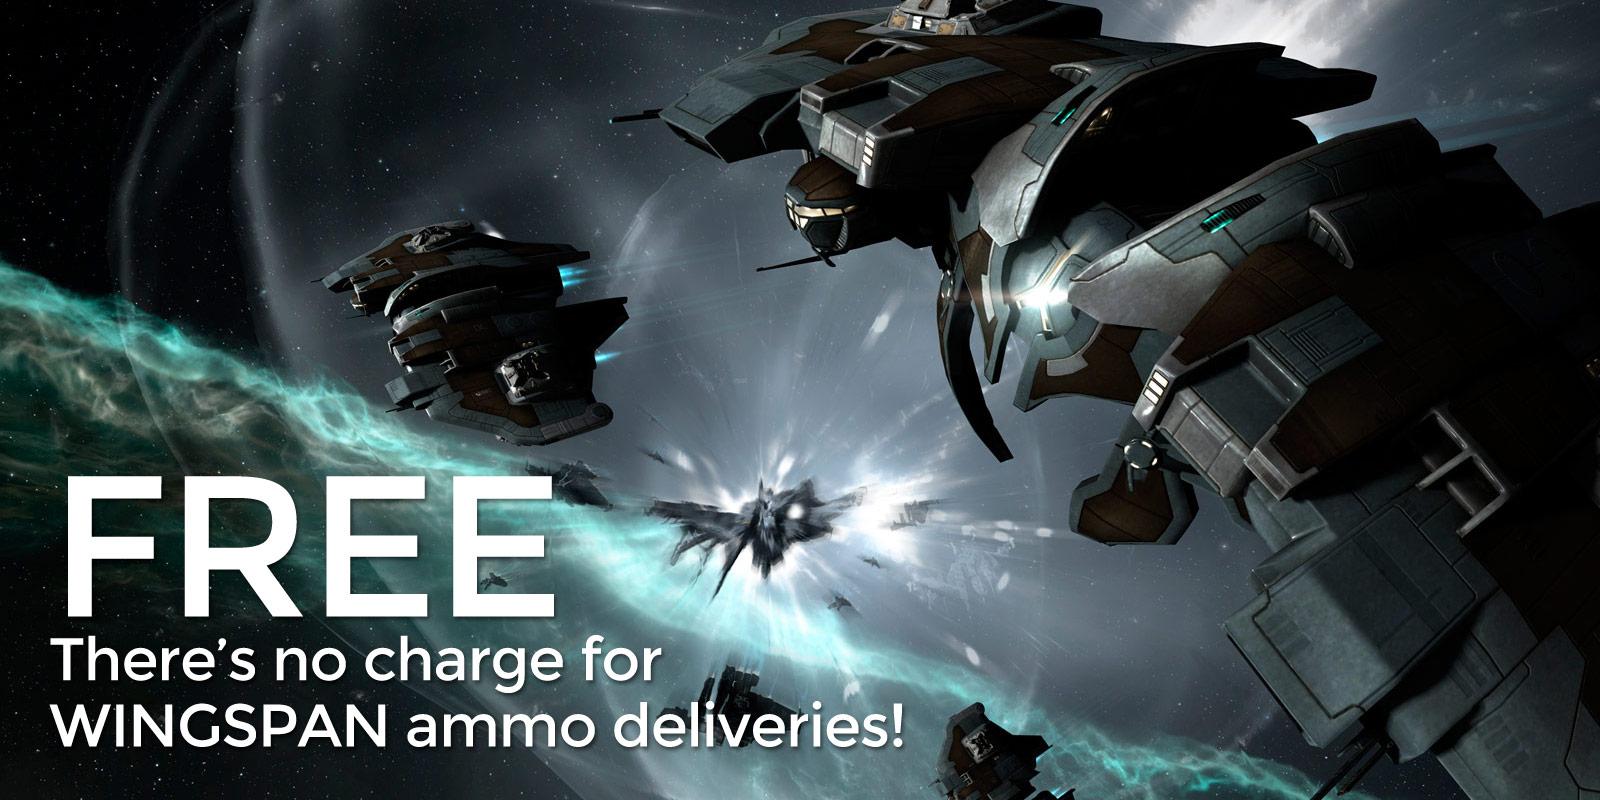 Nemesis-stealth-bomber-eve-online-free.jpg